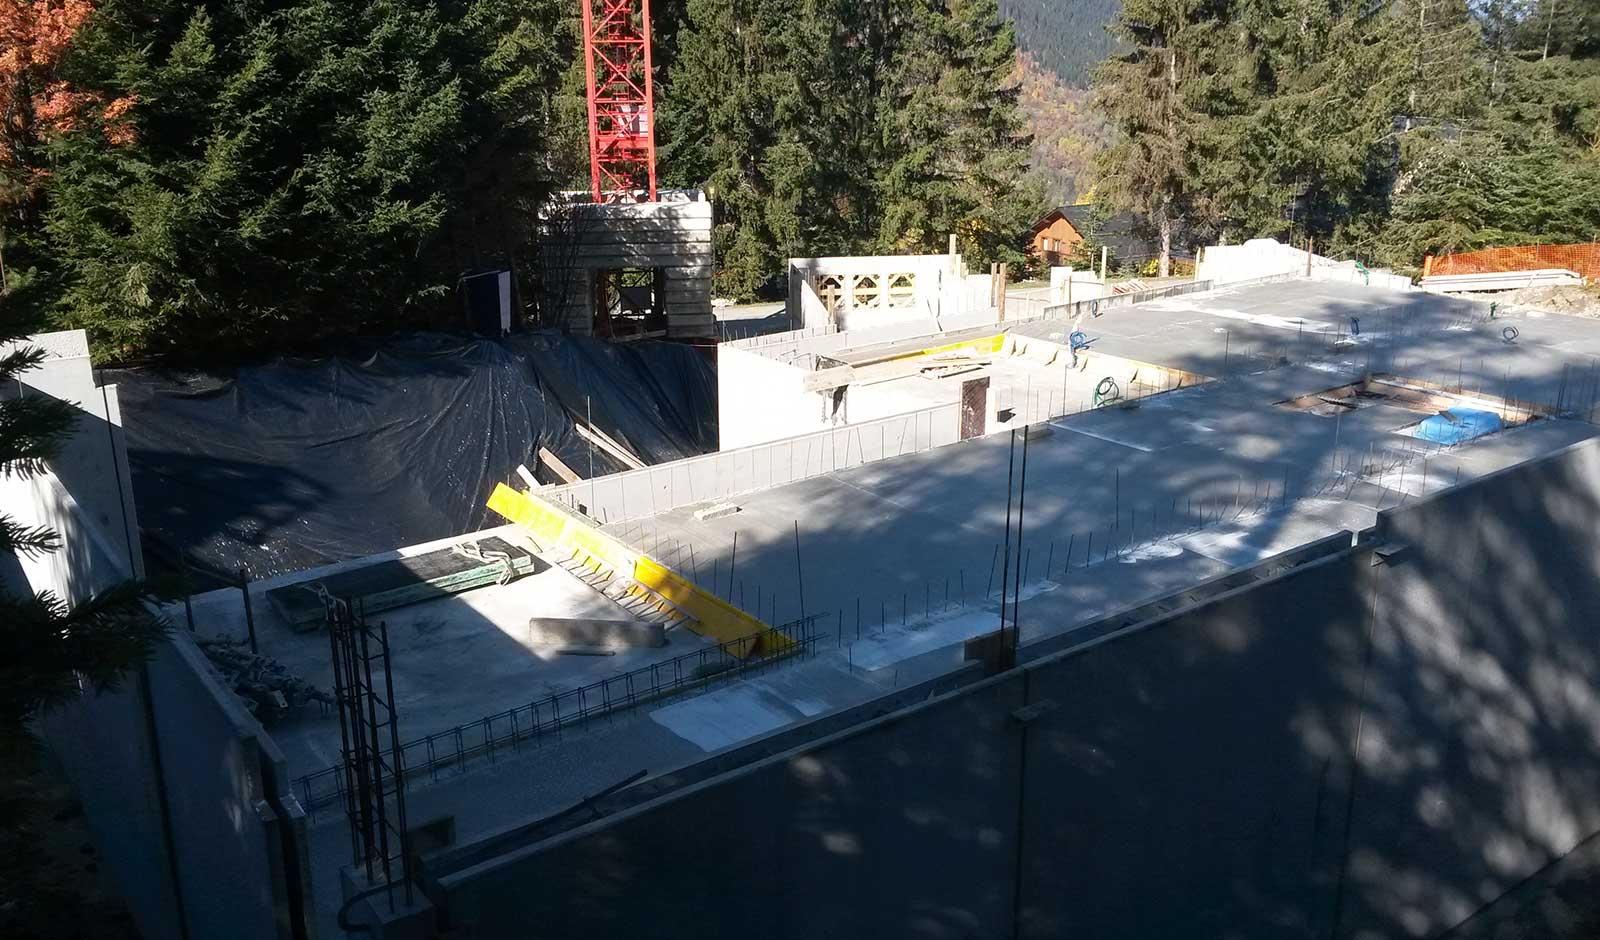 chalet-alpaca-3-atelier-crea-and-co-architecte-design-project-manager-meribel-savoie